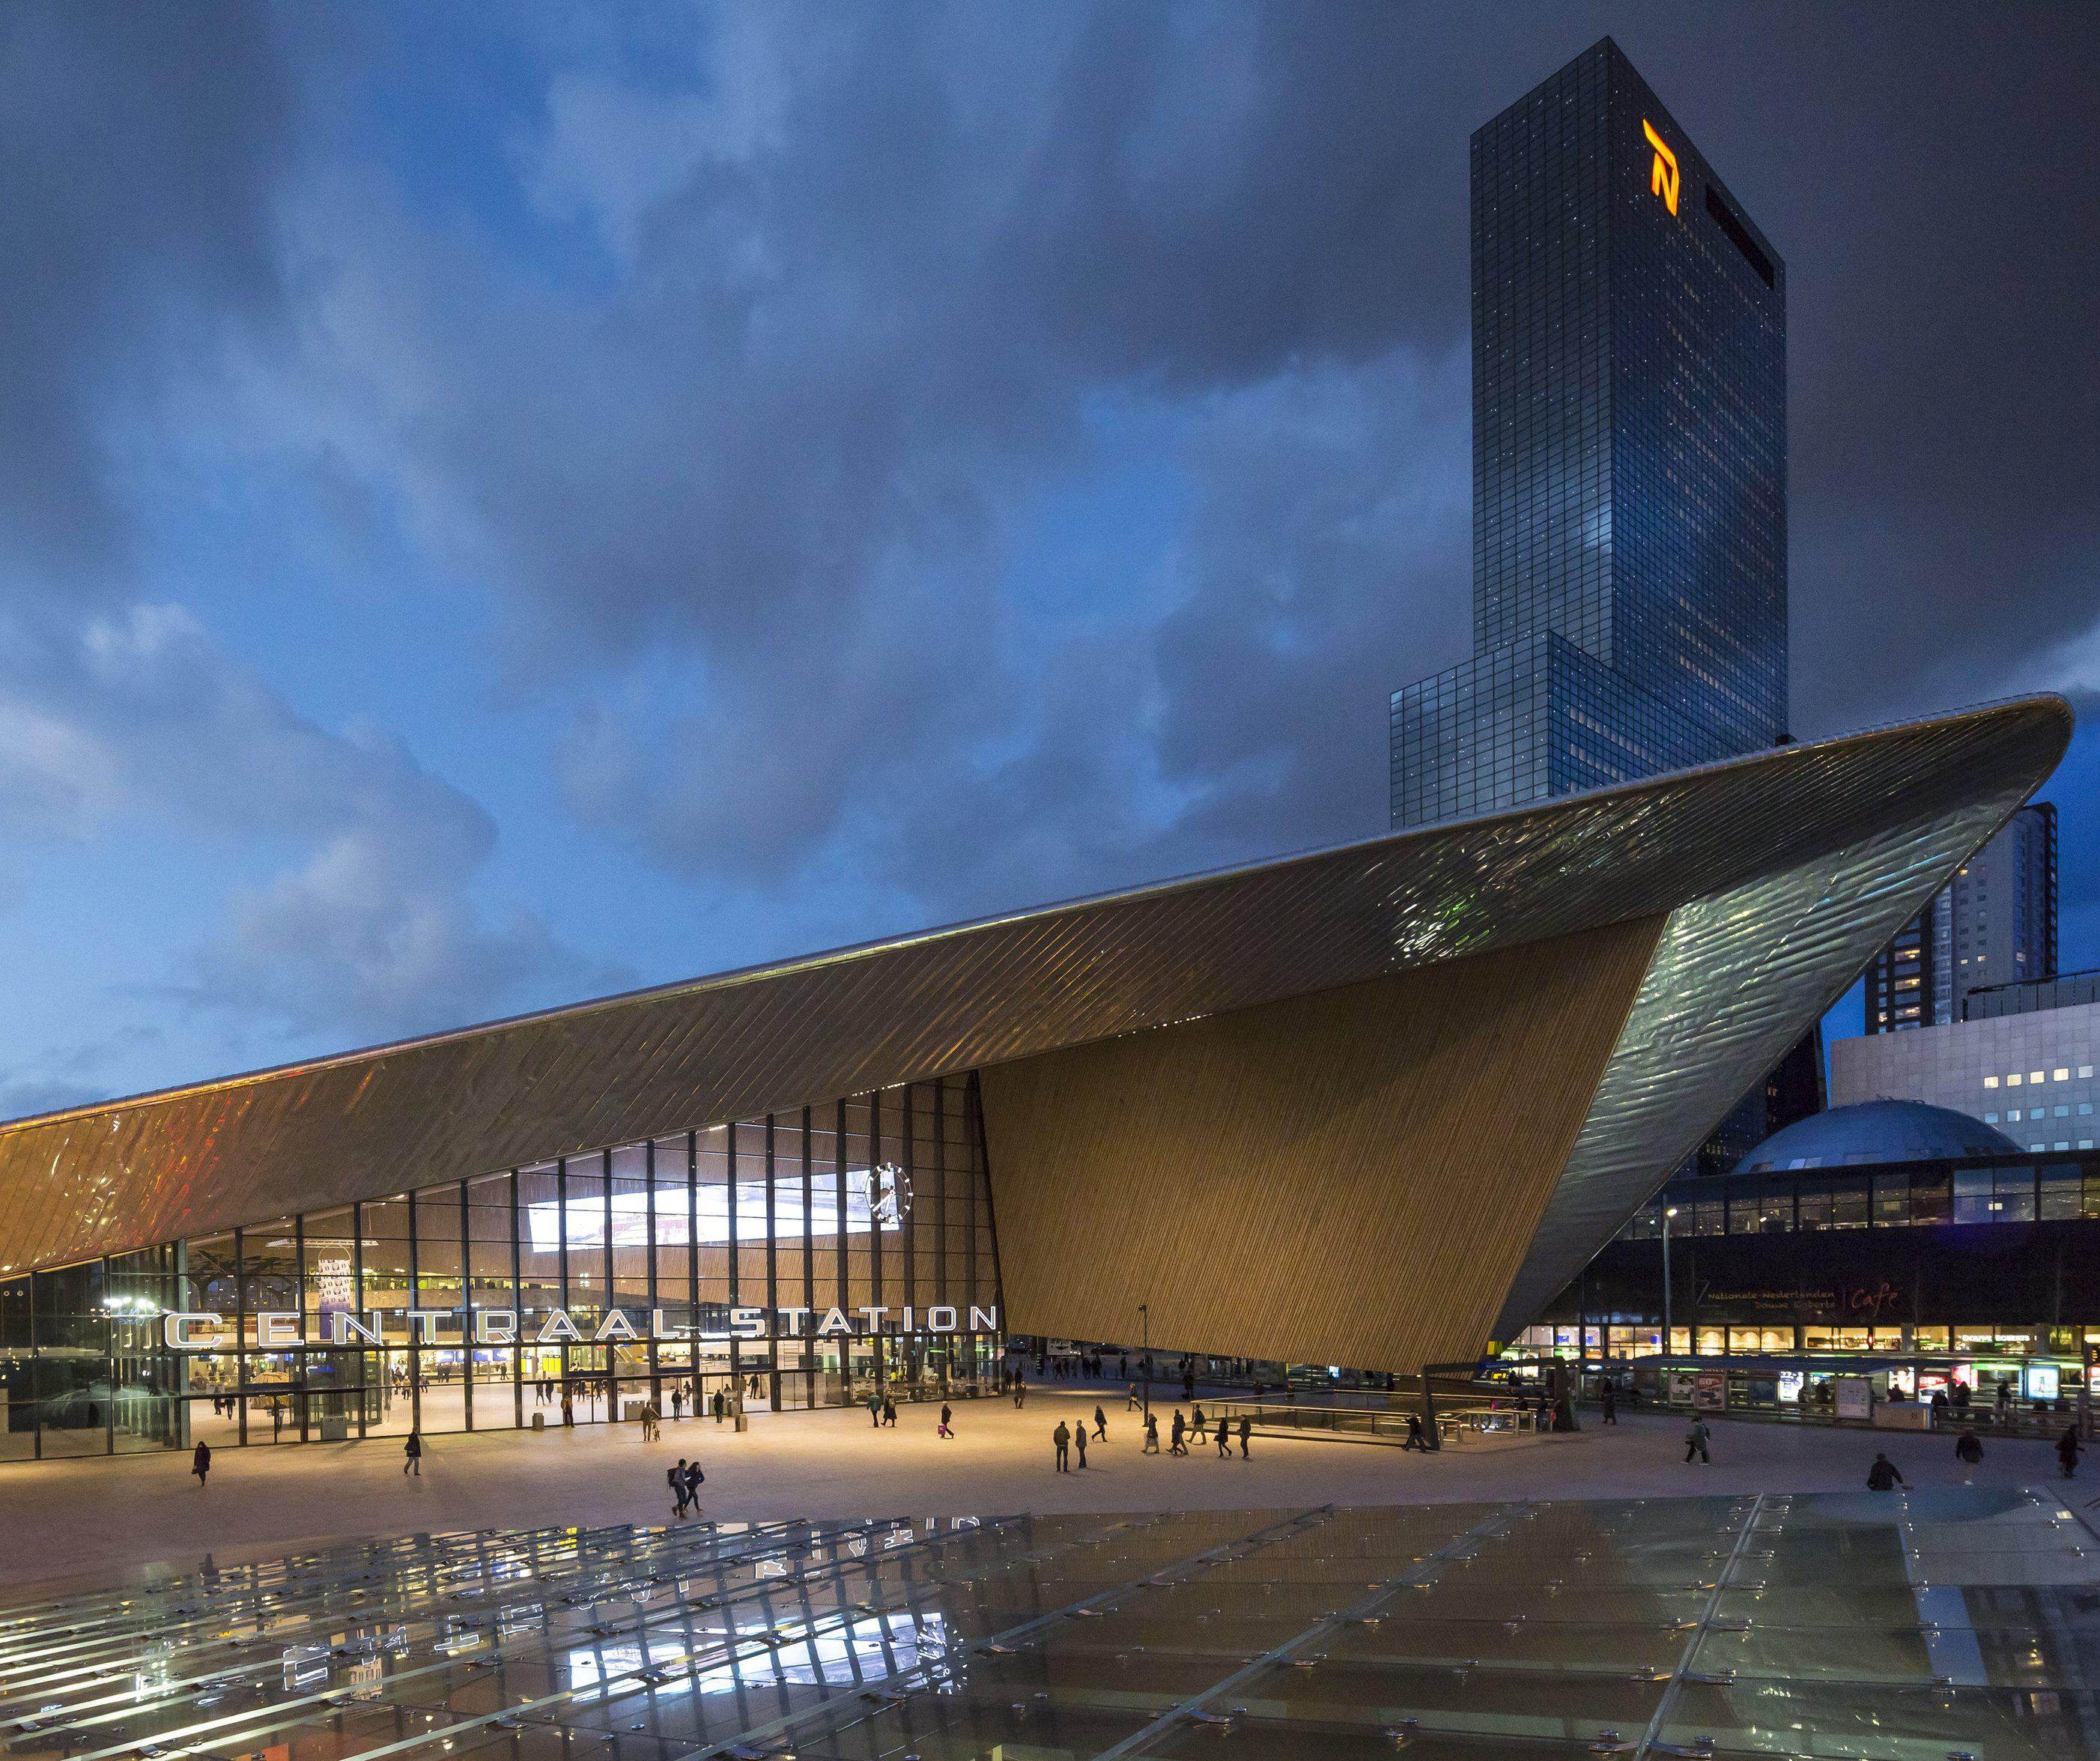 480 Rotterdam Centraal Station Team CS Benthem Crouwel Jannes Linders N15 a4 crop